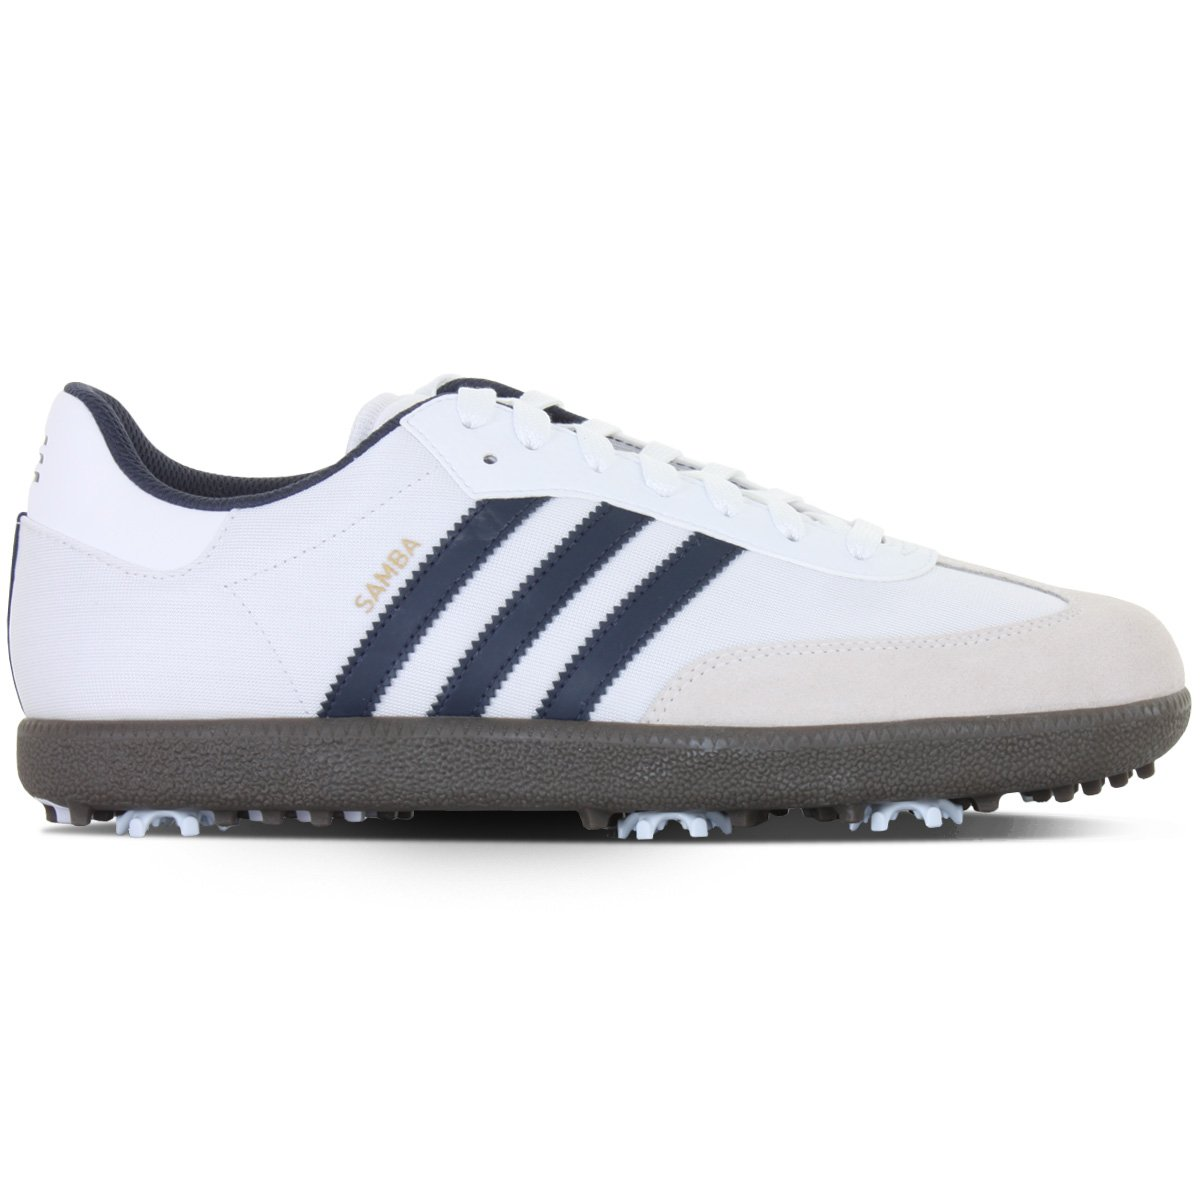 Adidas Samba Mens Golf Shoes Limited Edition US Open   New